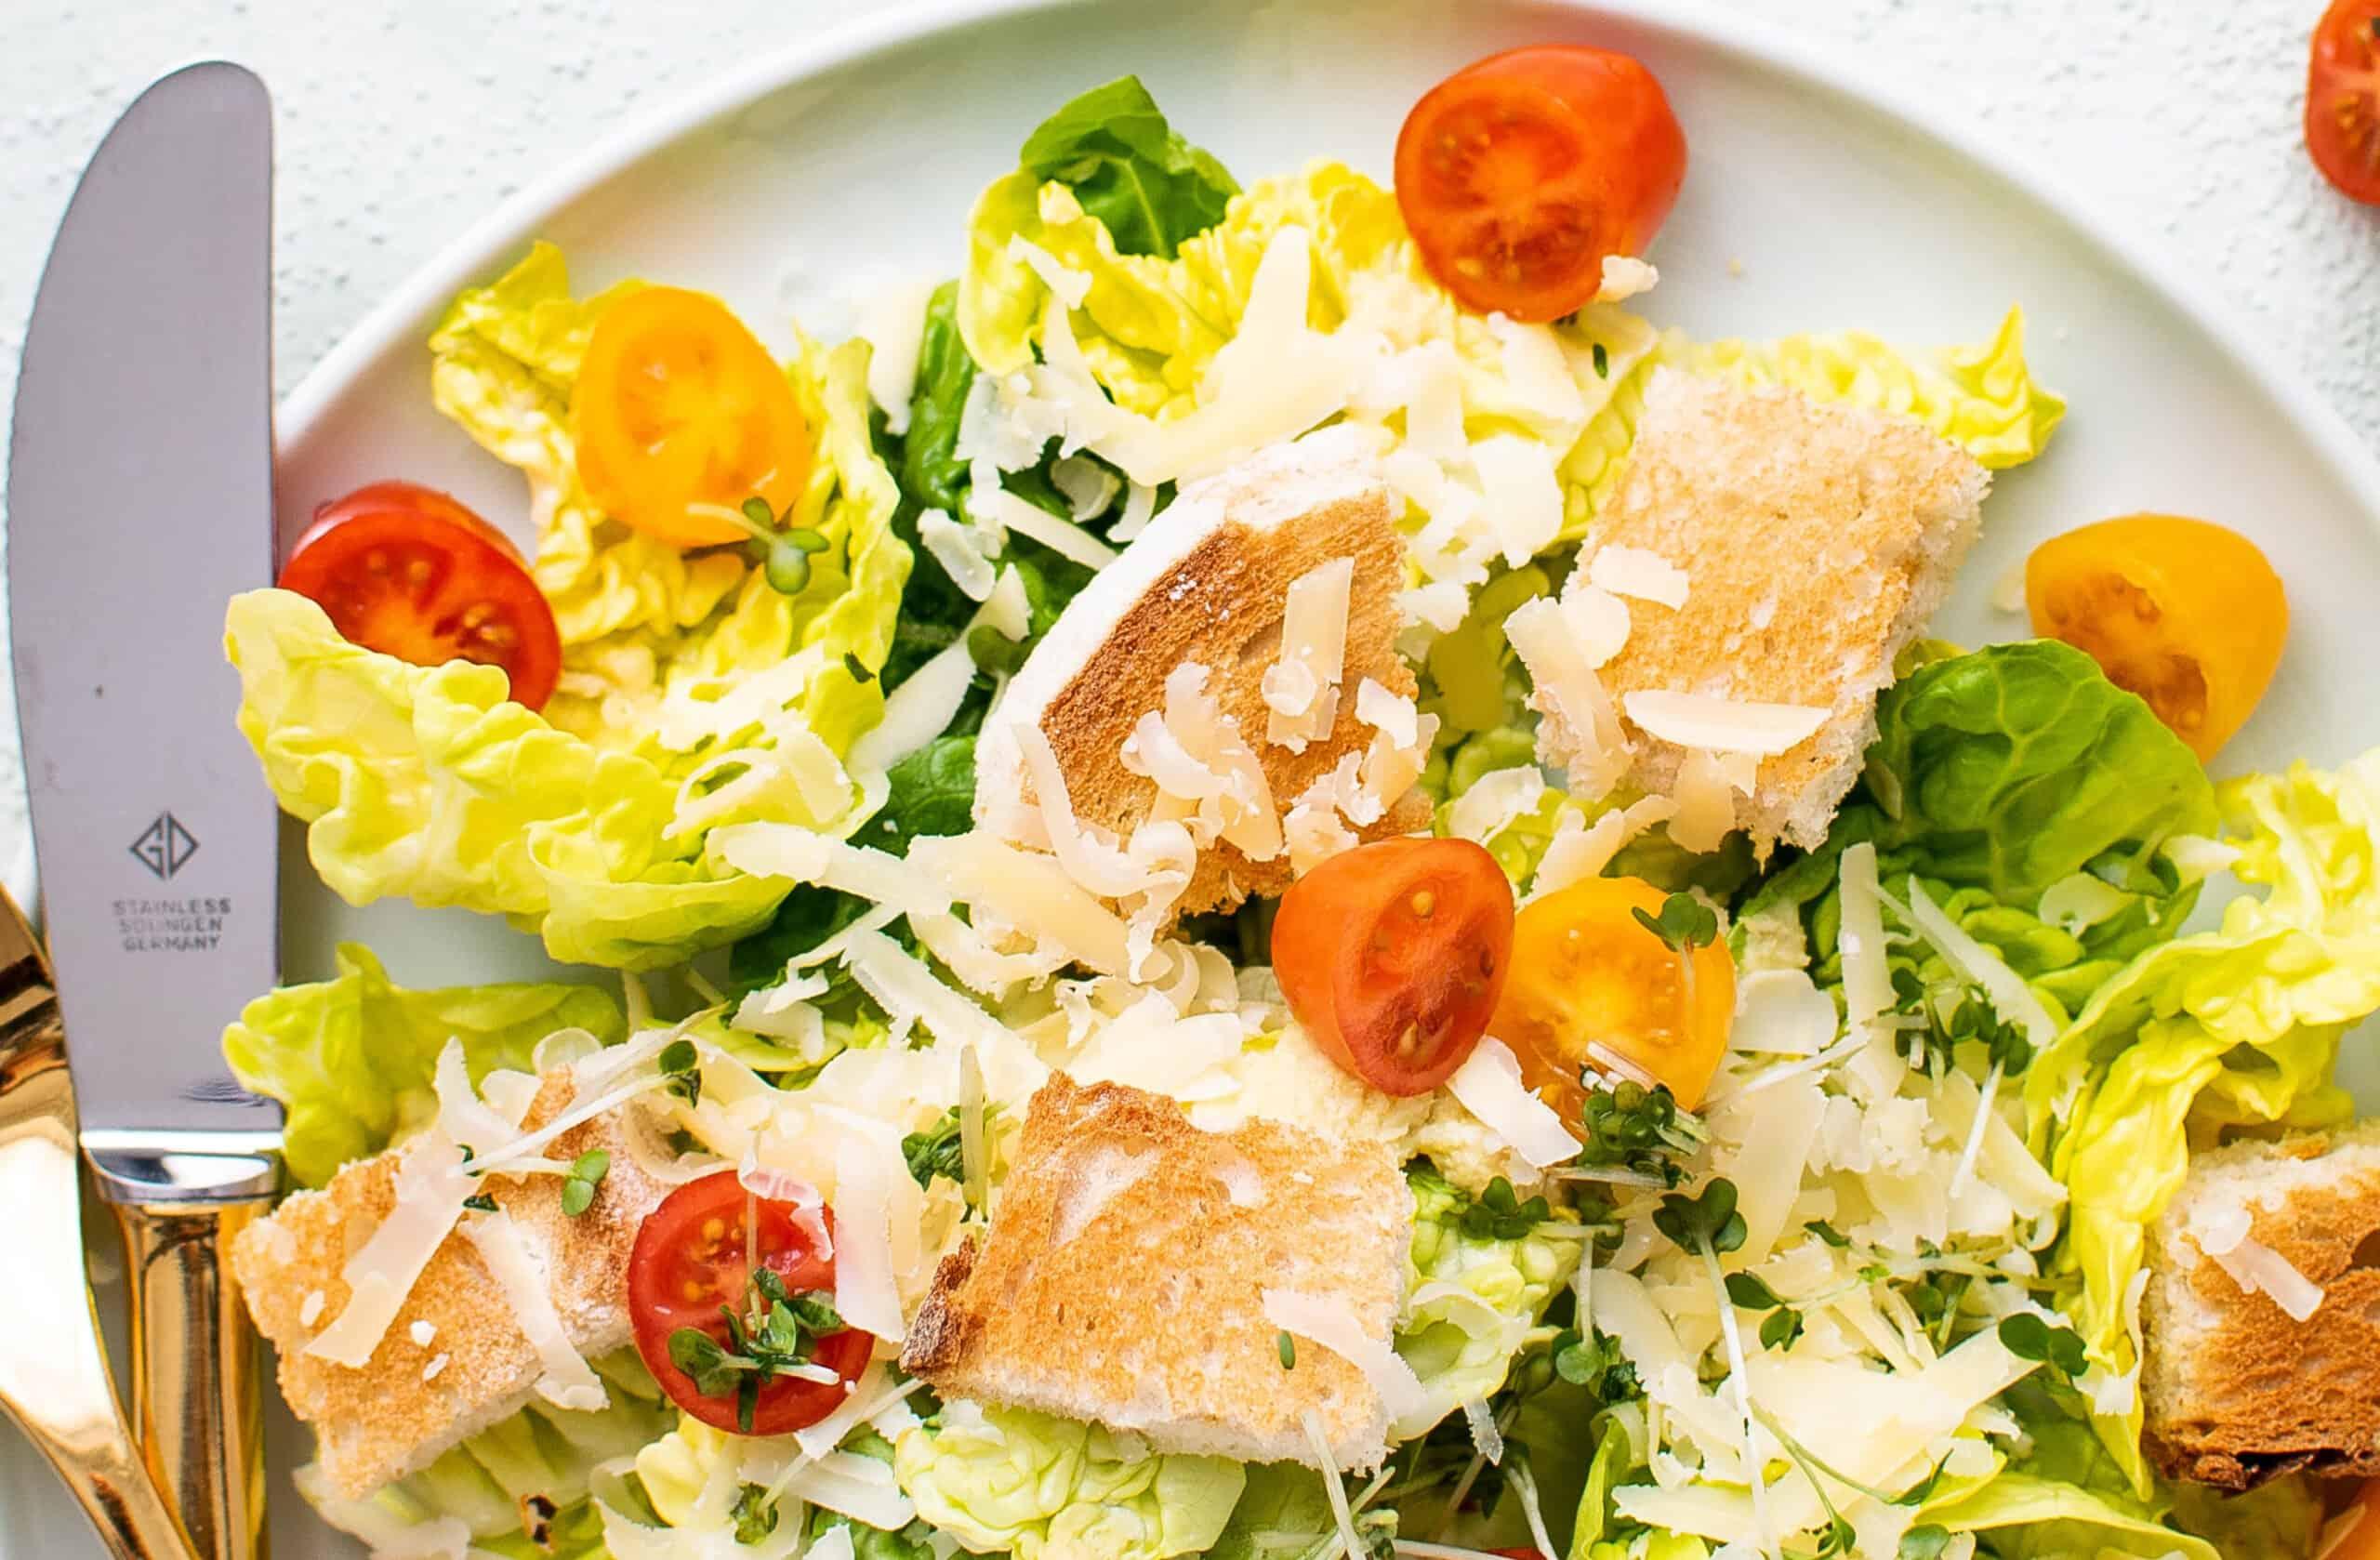 Gut healthy salad recipe suggestion